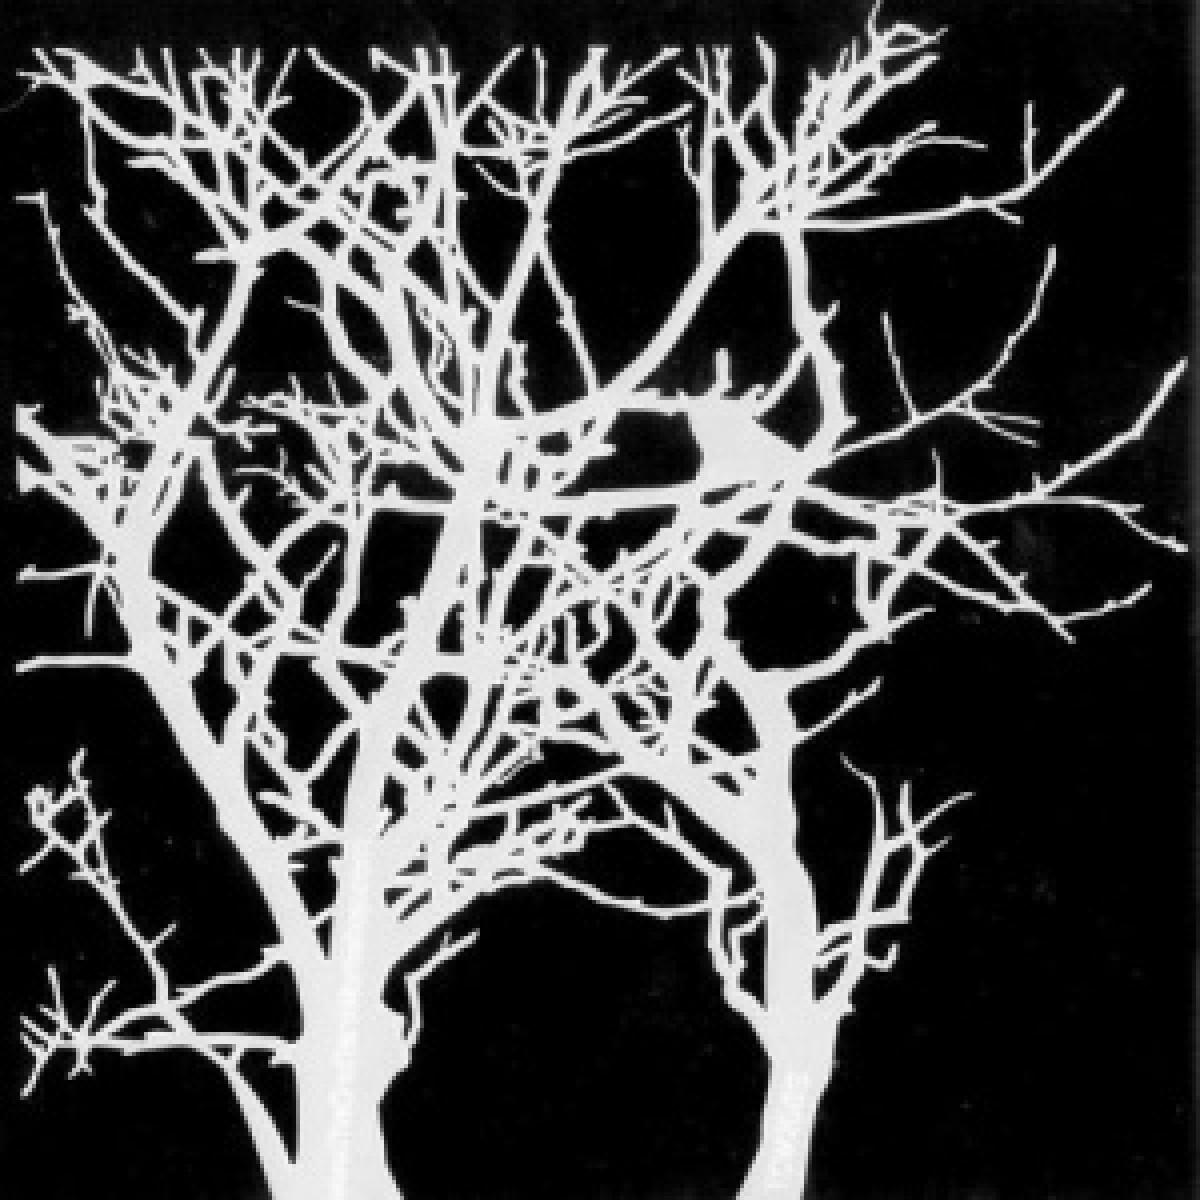 TCW, Stencil, 15x15, Mini Branches - maske